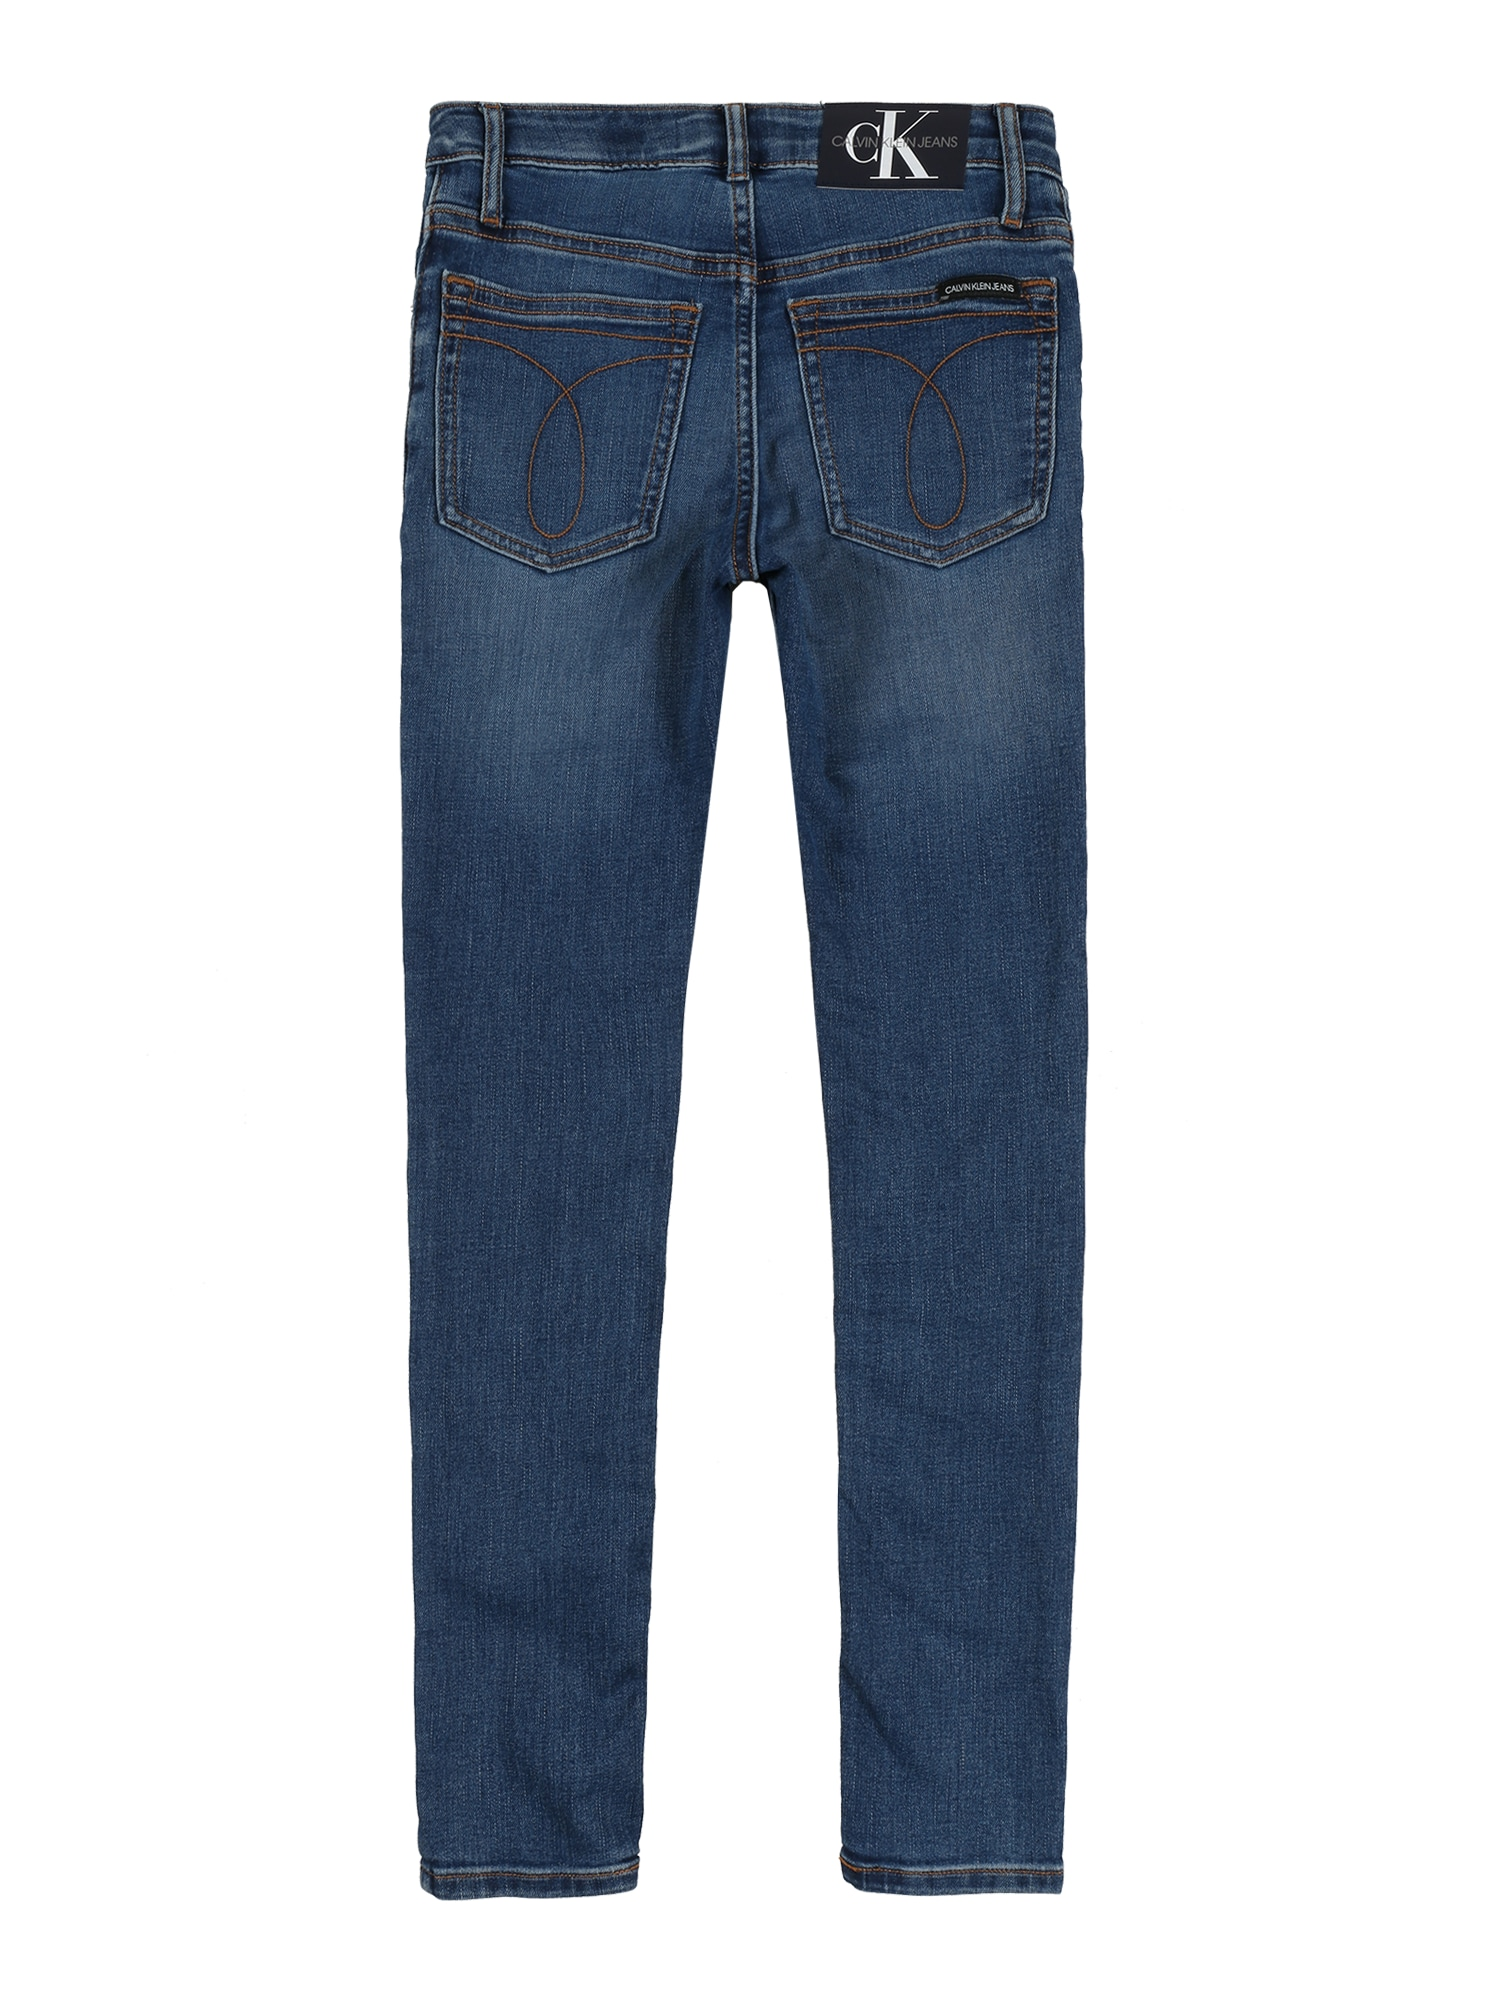 Calvin Klein Jeans Jeans  blå denim